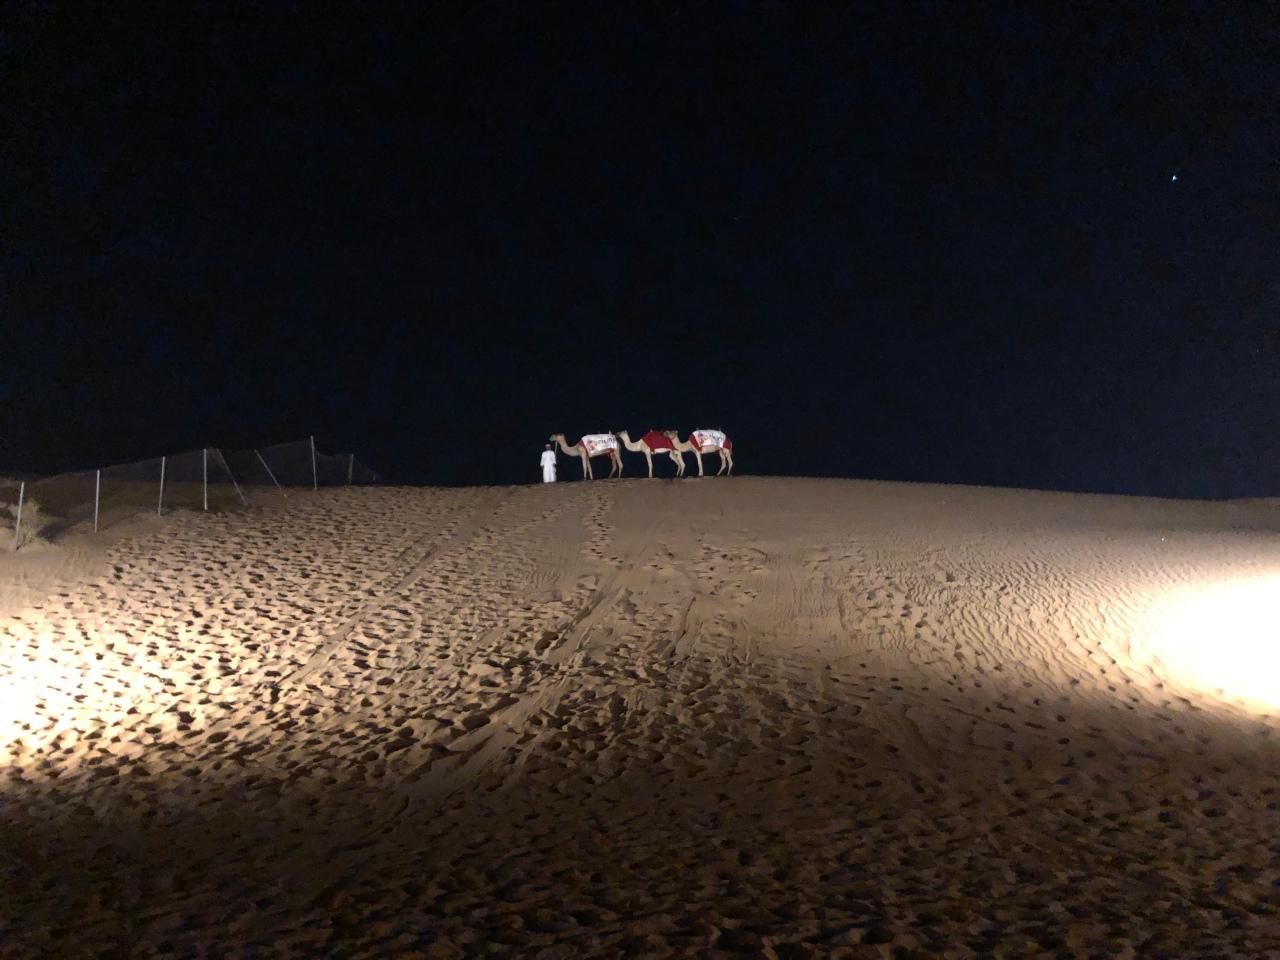 Camels at night Dubai desert